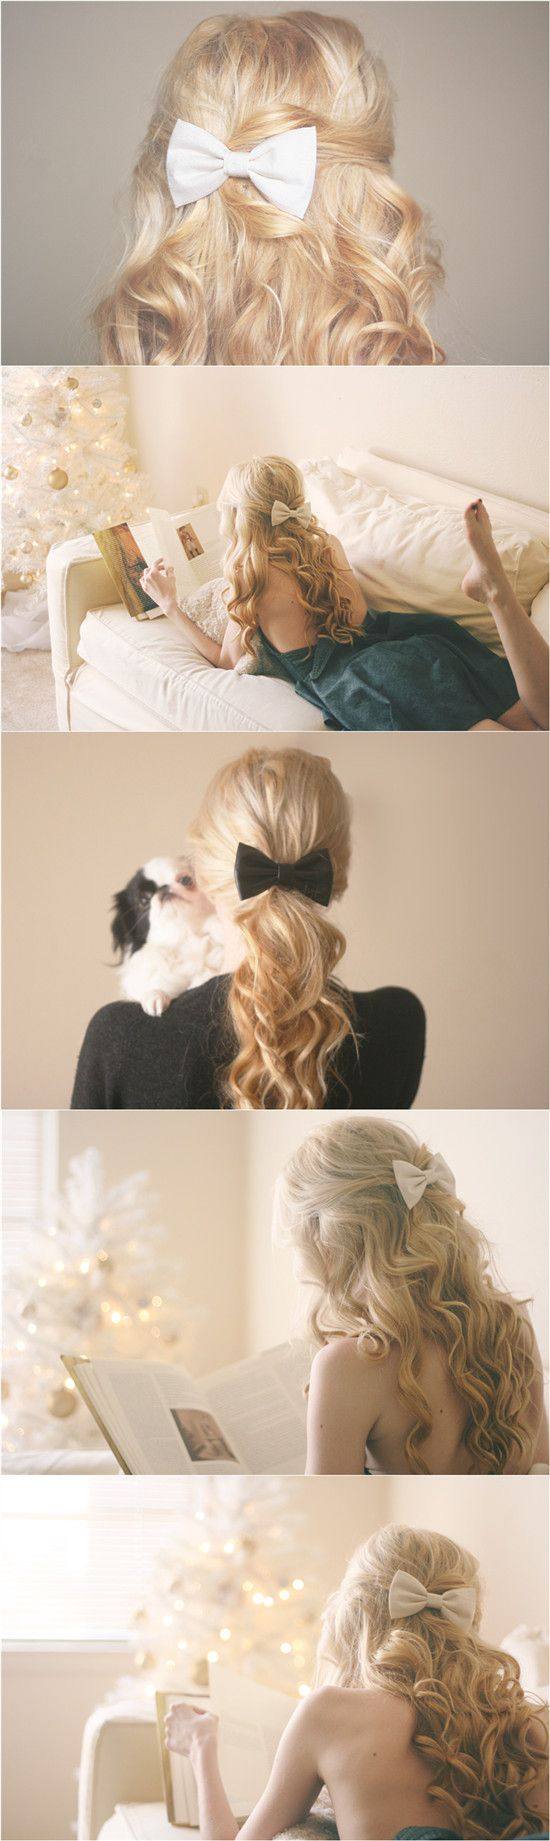 best my future wedding images on pinterest wedding inspiration